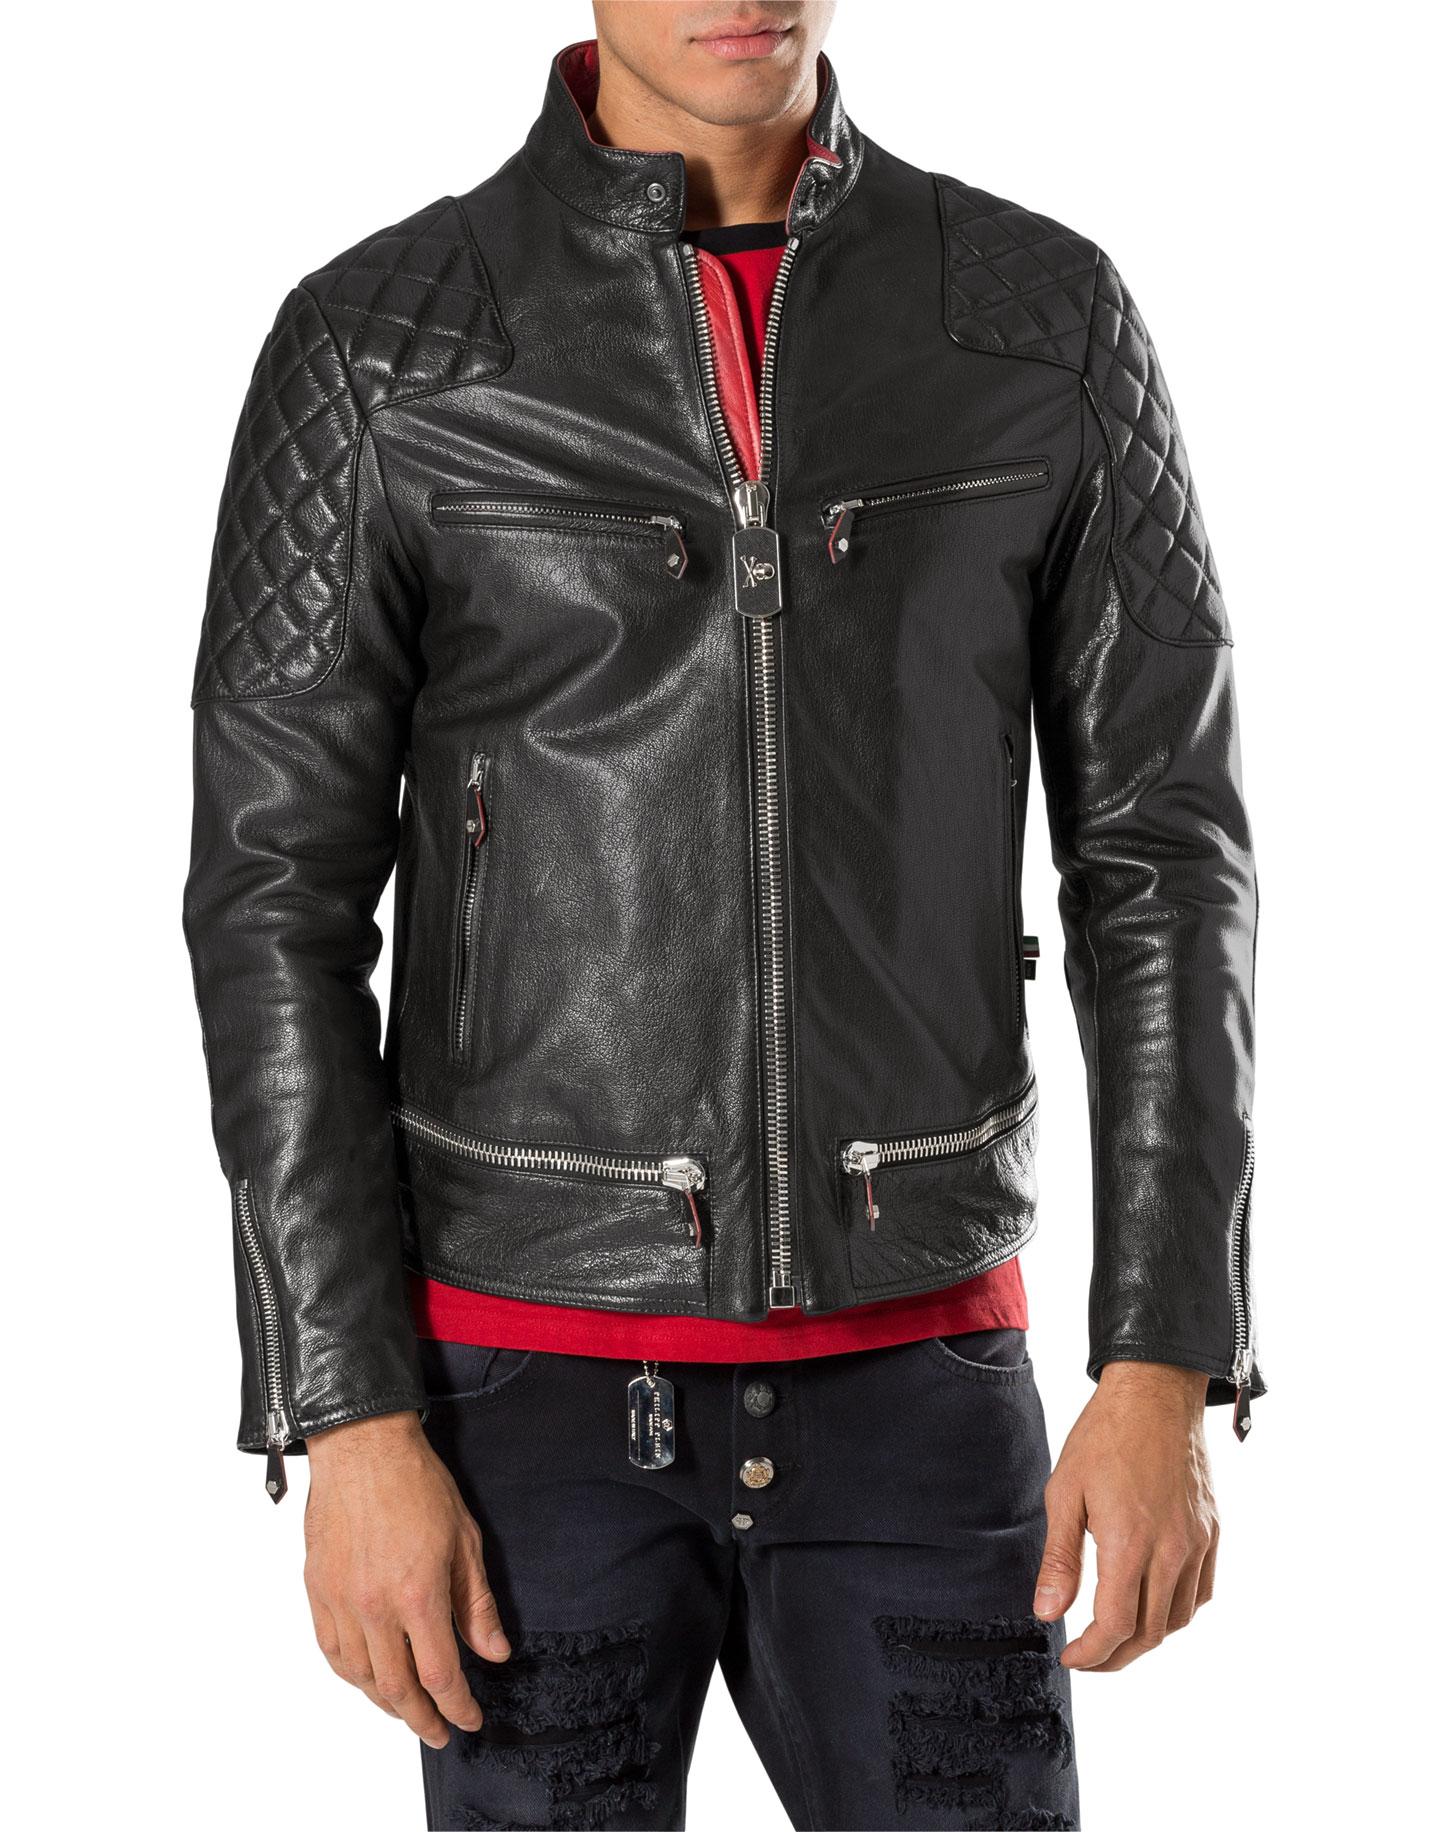 leather jacket have fun philipp plein outlet. Black Bedroom Furniture Sets. Home Design Ideas